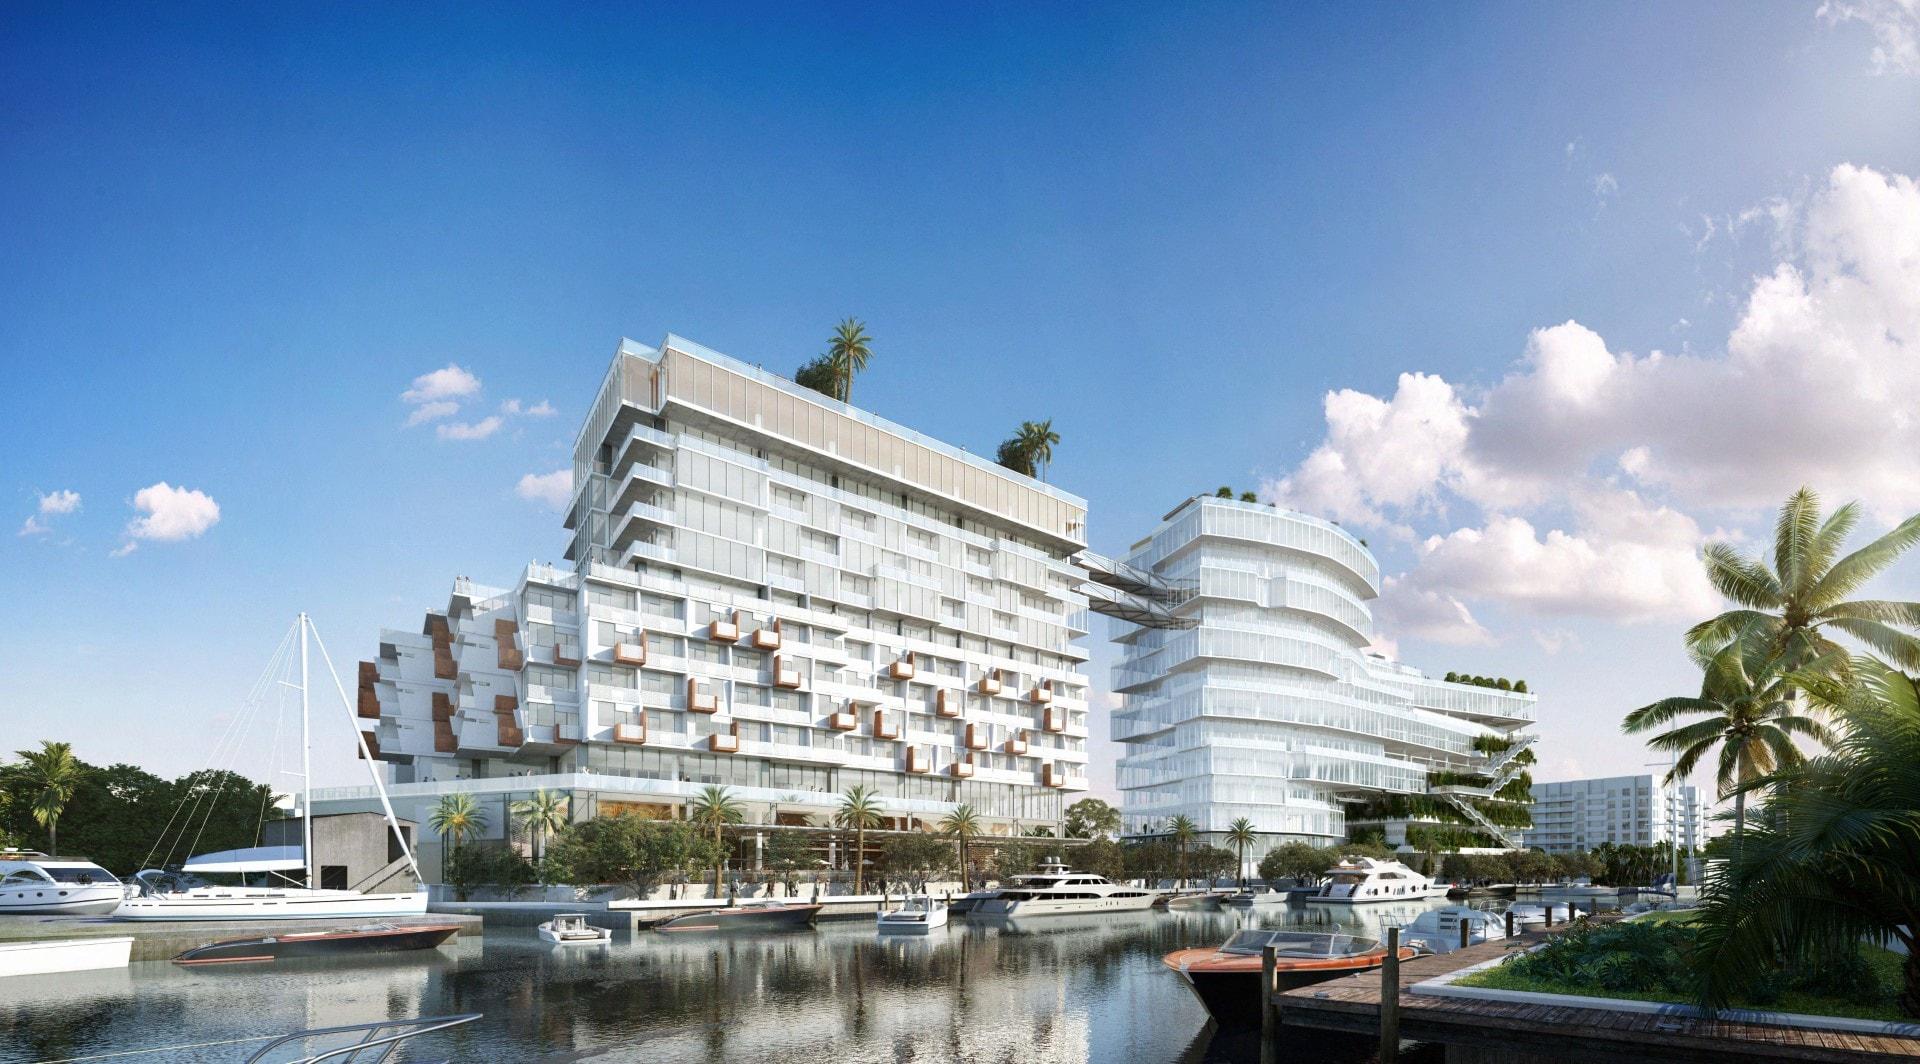 Avra Jain To Break Ground On 555 River House In January 2020